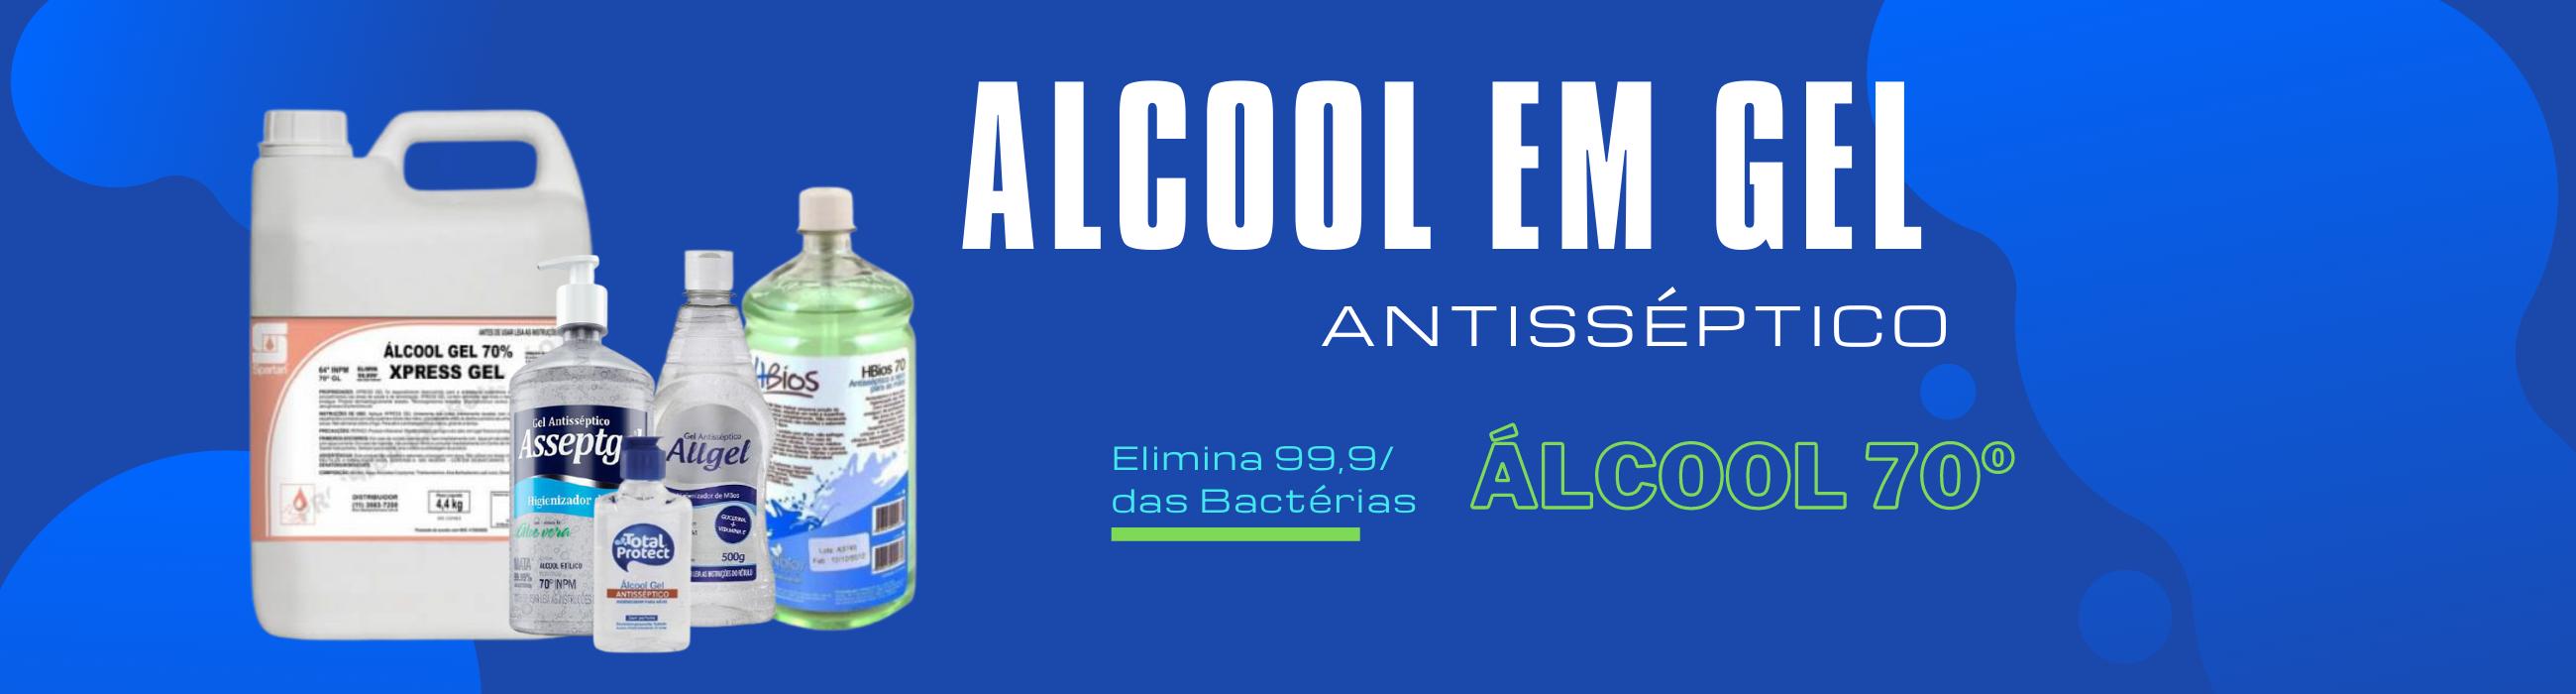 alcoolemgel